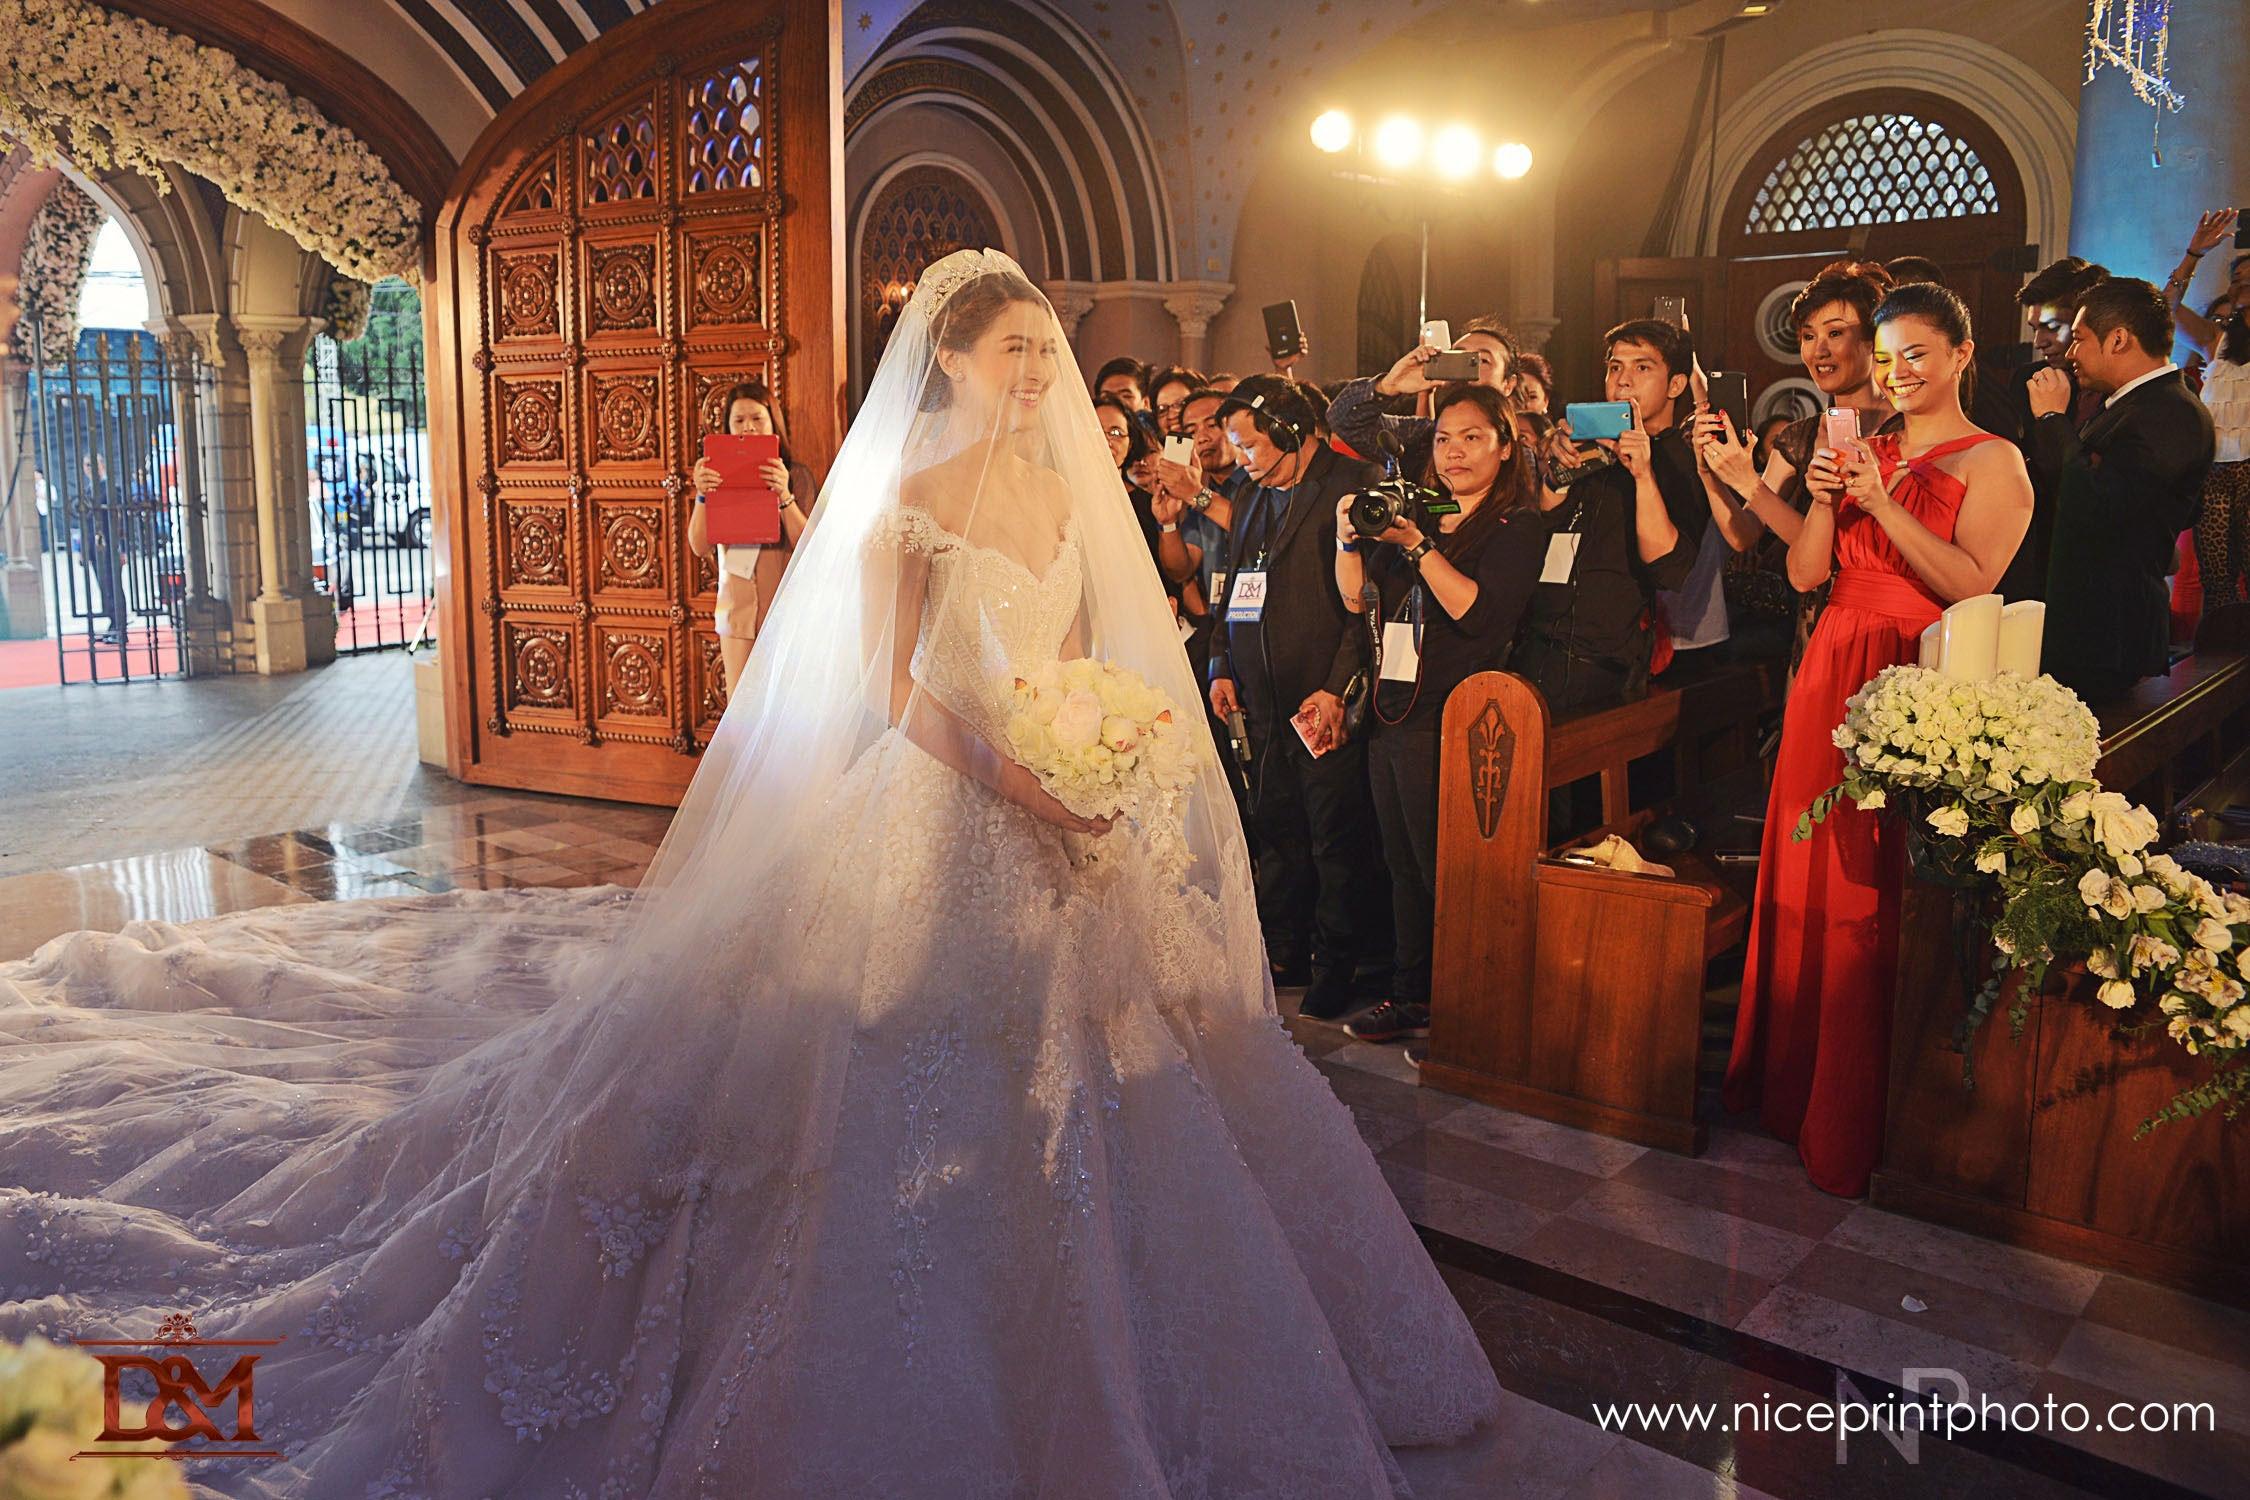 Dingdong Dantes Marian Rivera Royal Wedding In Photos Inquirer